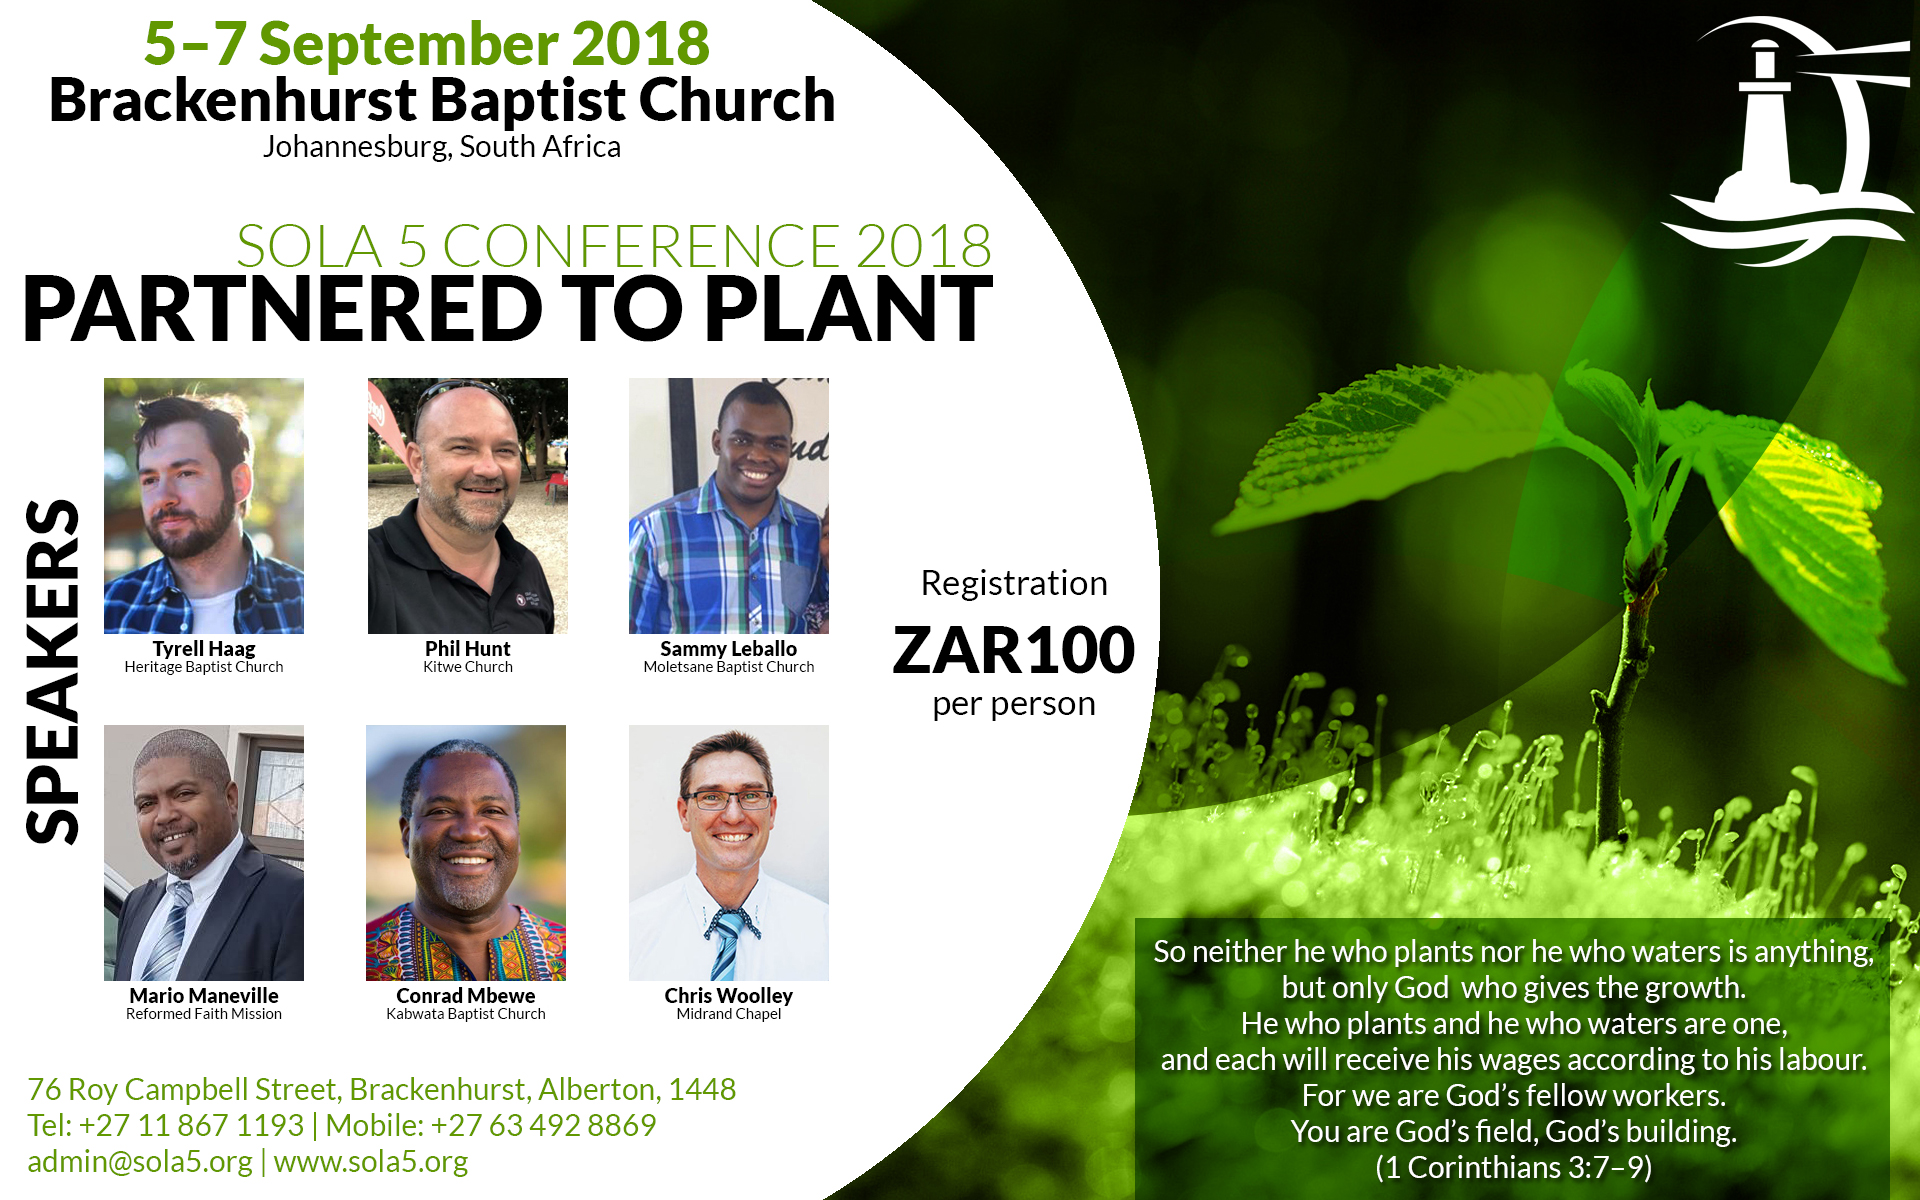 Sola 5 Conference 2018: Partnered to Plant | Brackenhurst Baptist Church